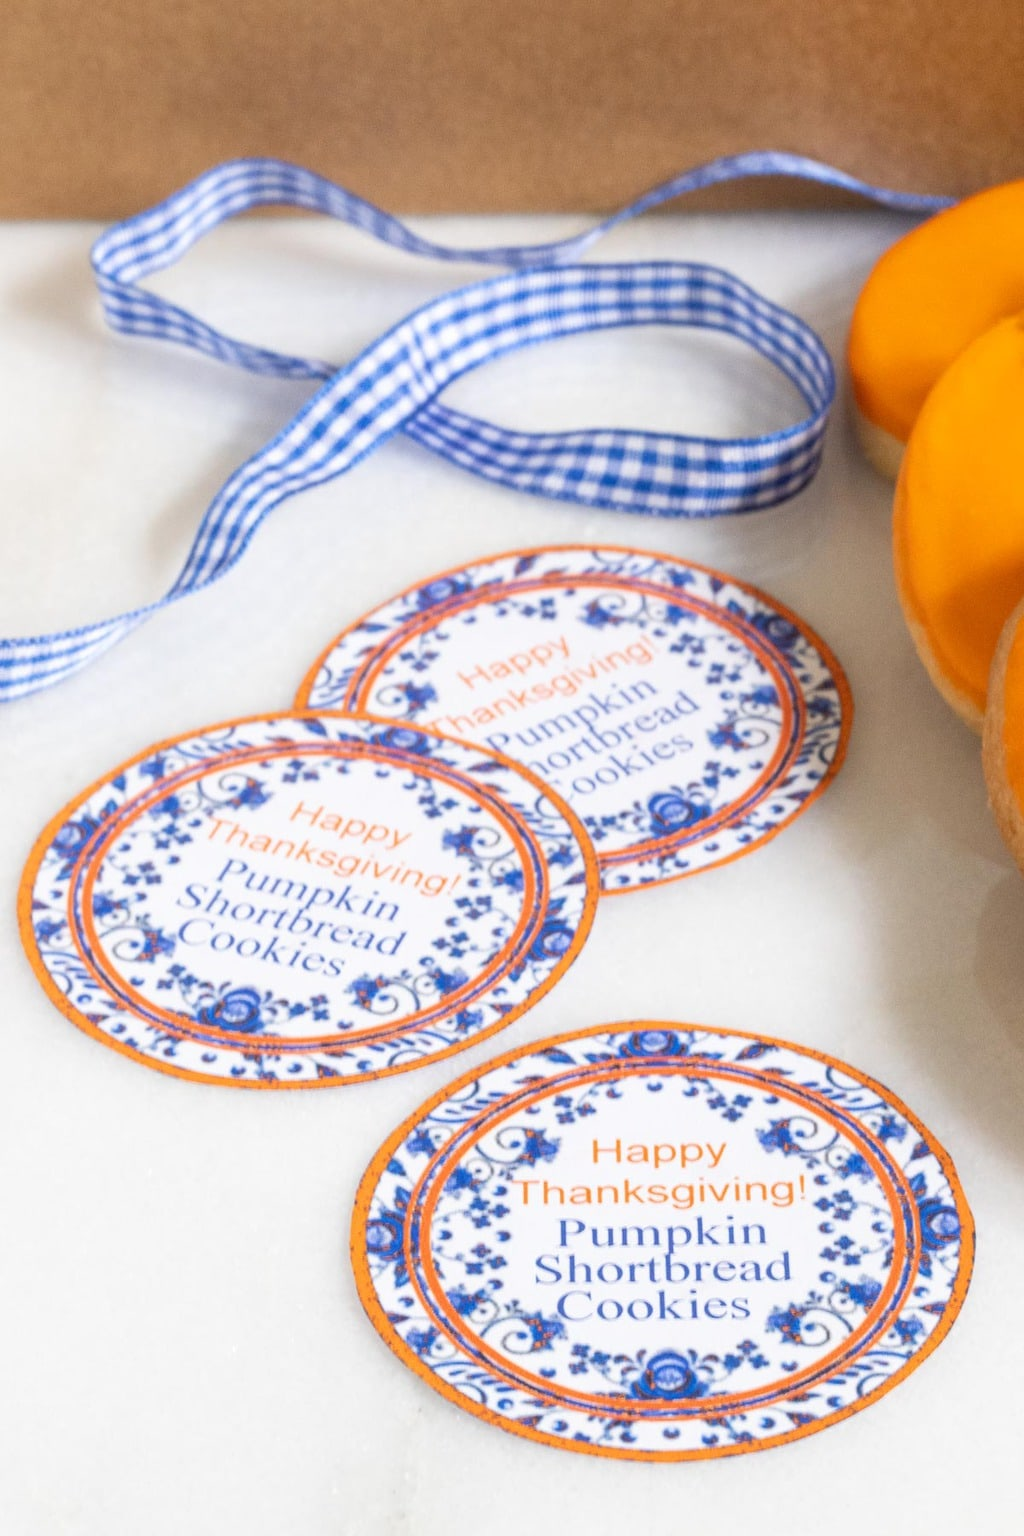 Vertical closeup photo of a set of Happy Thanksgiving Pumpkin Shortbread Cookies.